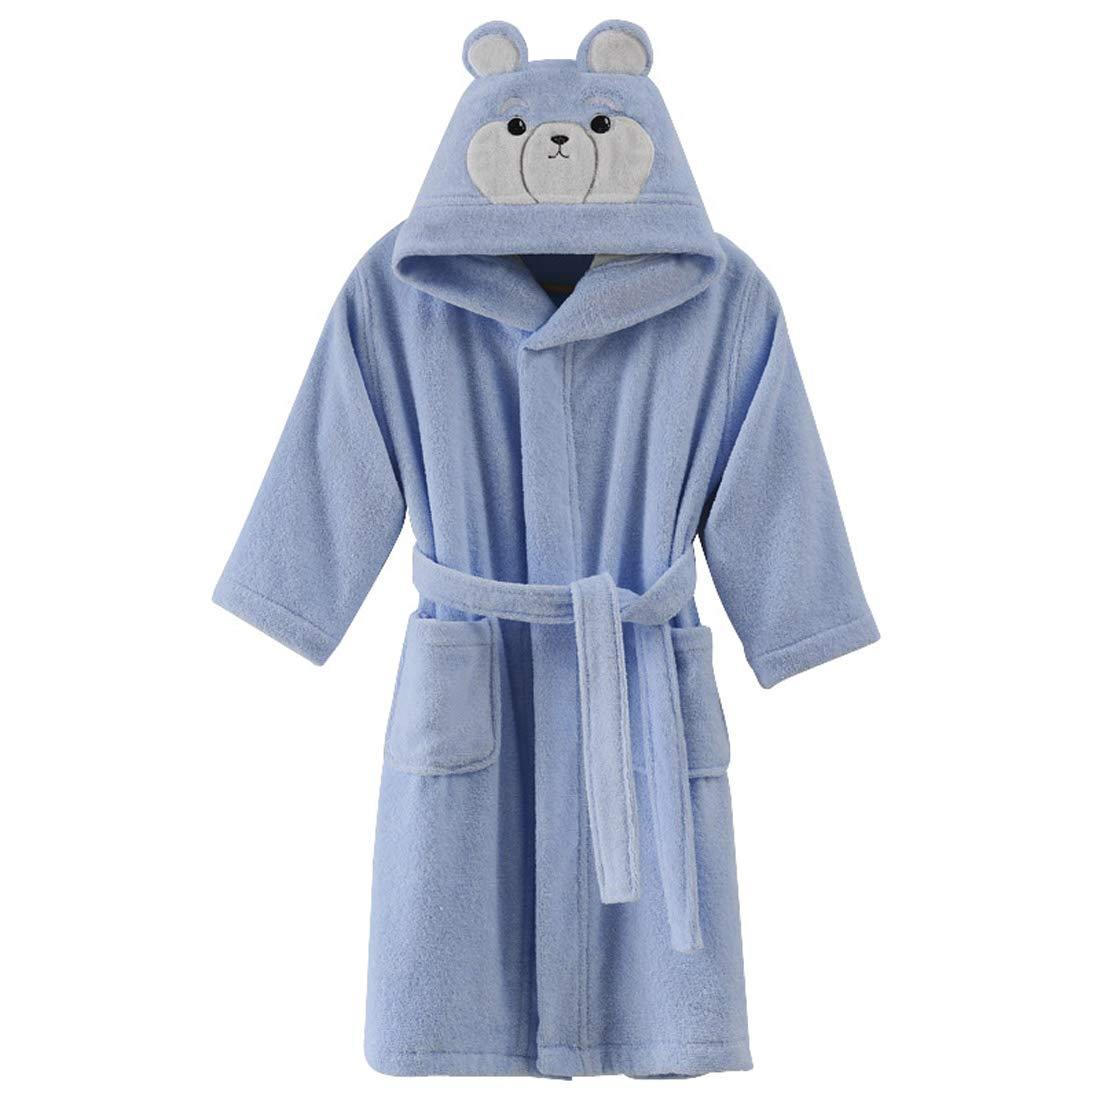 Kids Cotton Terry Cloth Robe Boys Girls Bathrobe Long Sleeve Hoodie Animal Pajamas